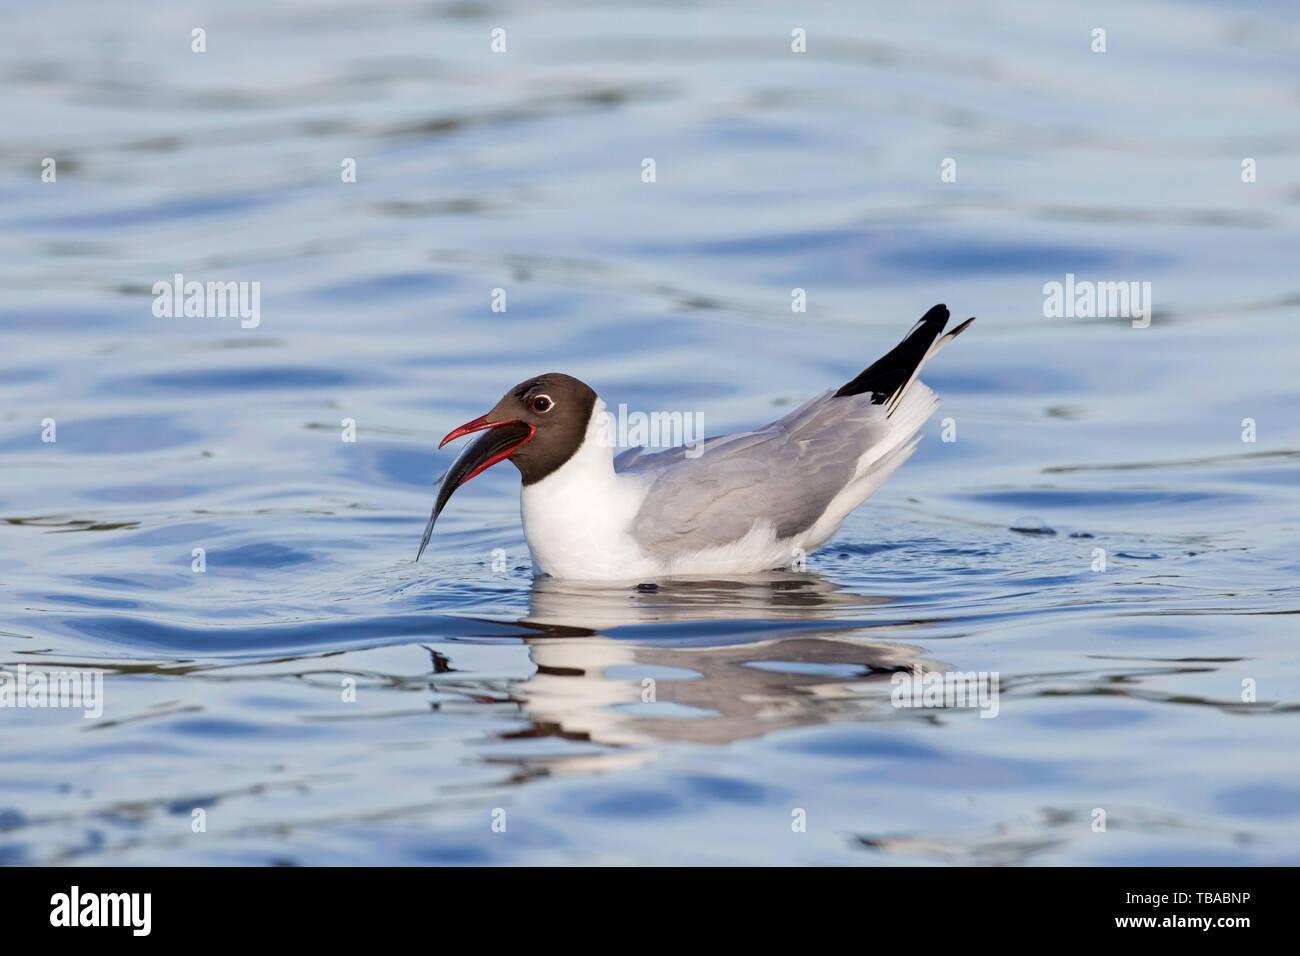 Black-headed gull (Chroicocephalus ridibundus / Larus ridibundus) swimming in lake with caught fish in beak Stock Photo